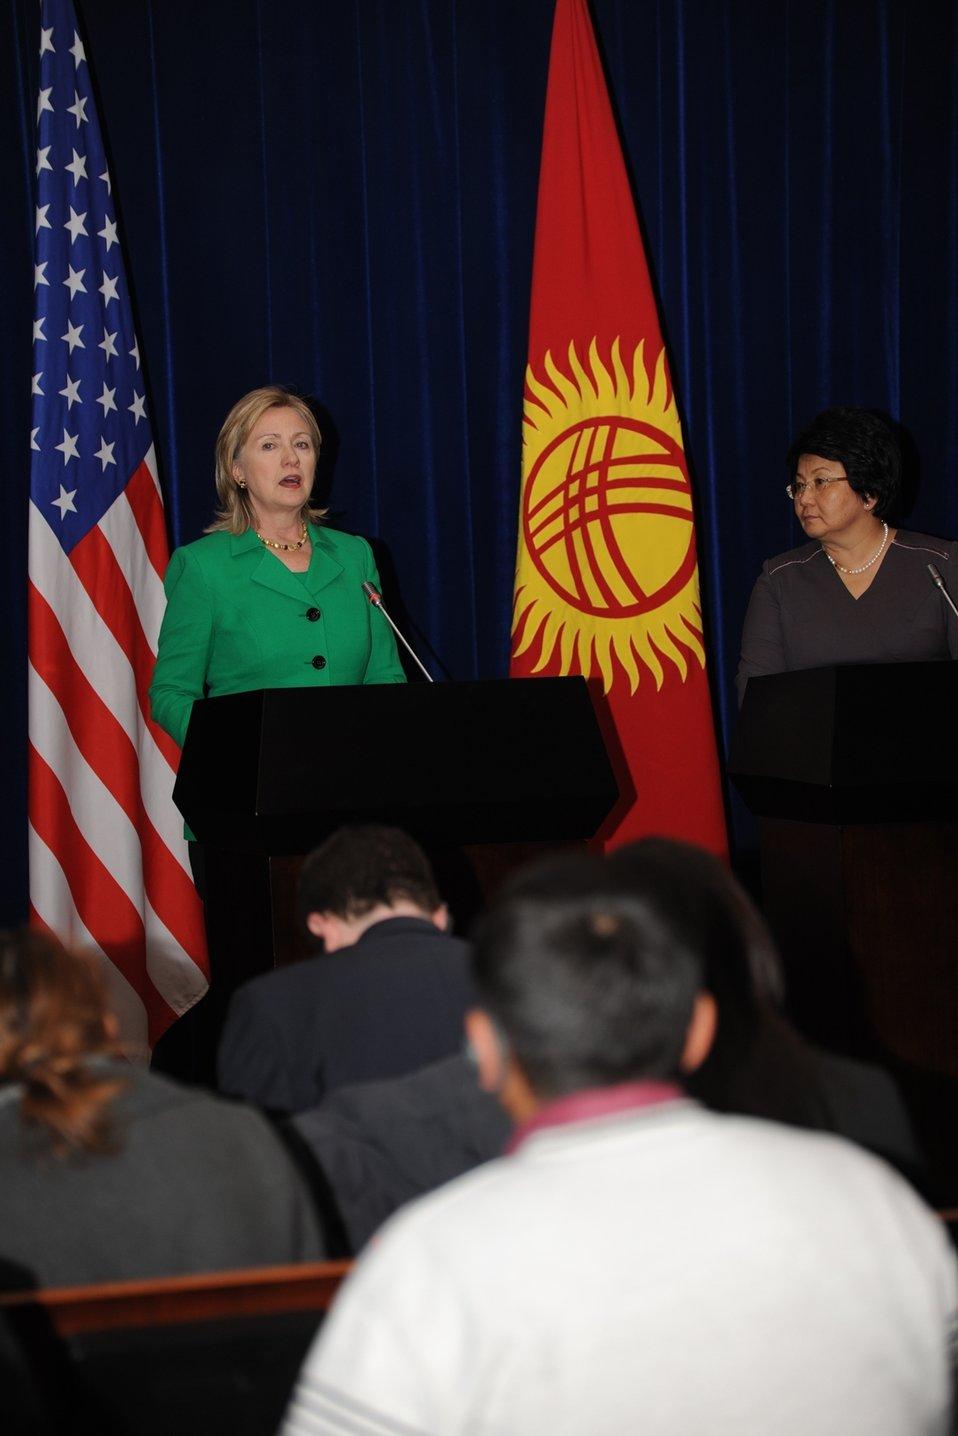 Secretary Clinton and Kyrgyz President Otunbaeva Hold a Press Conference